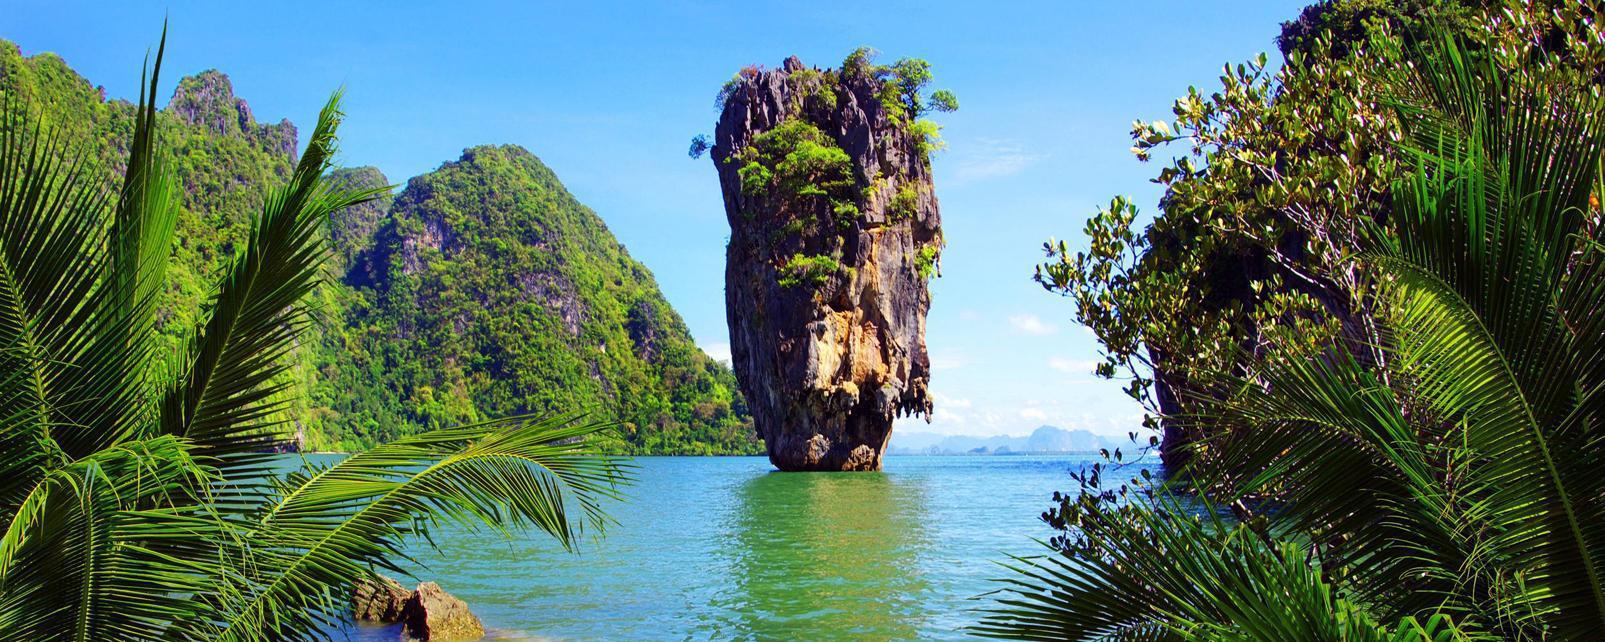 Bon Plan, Voyager en thaïlande hors saison